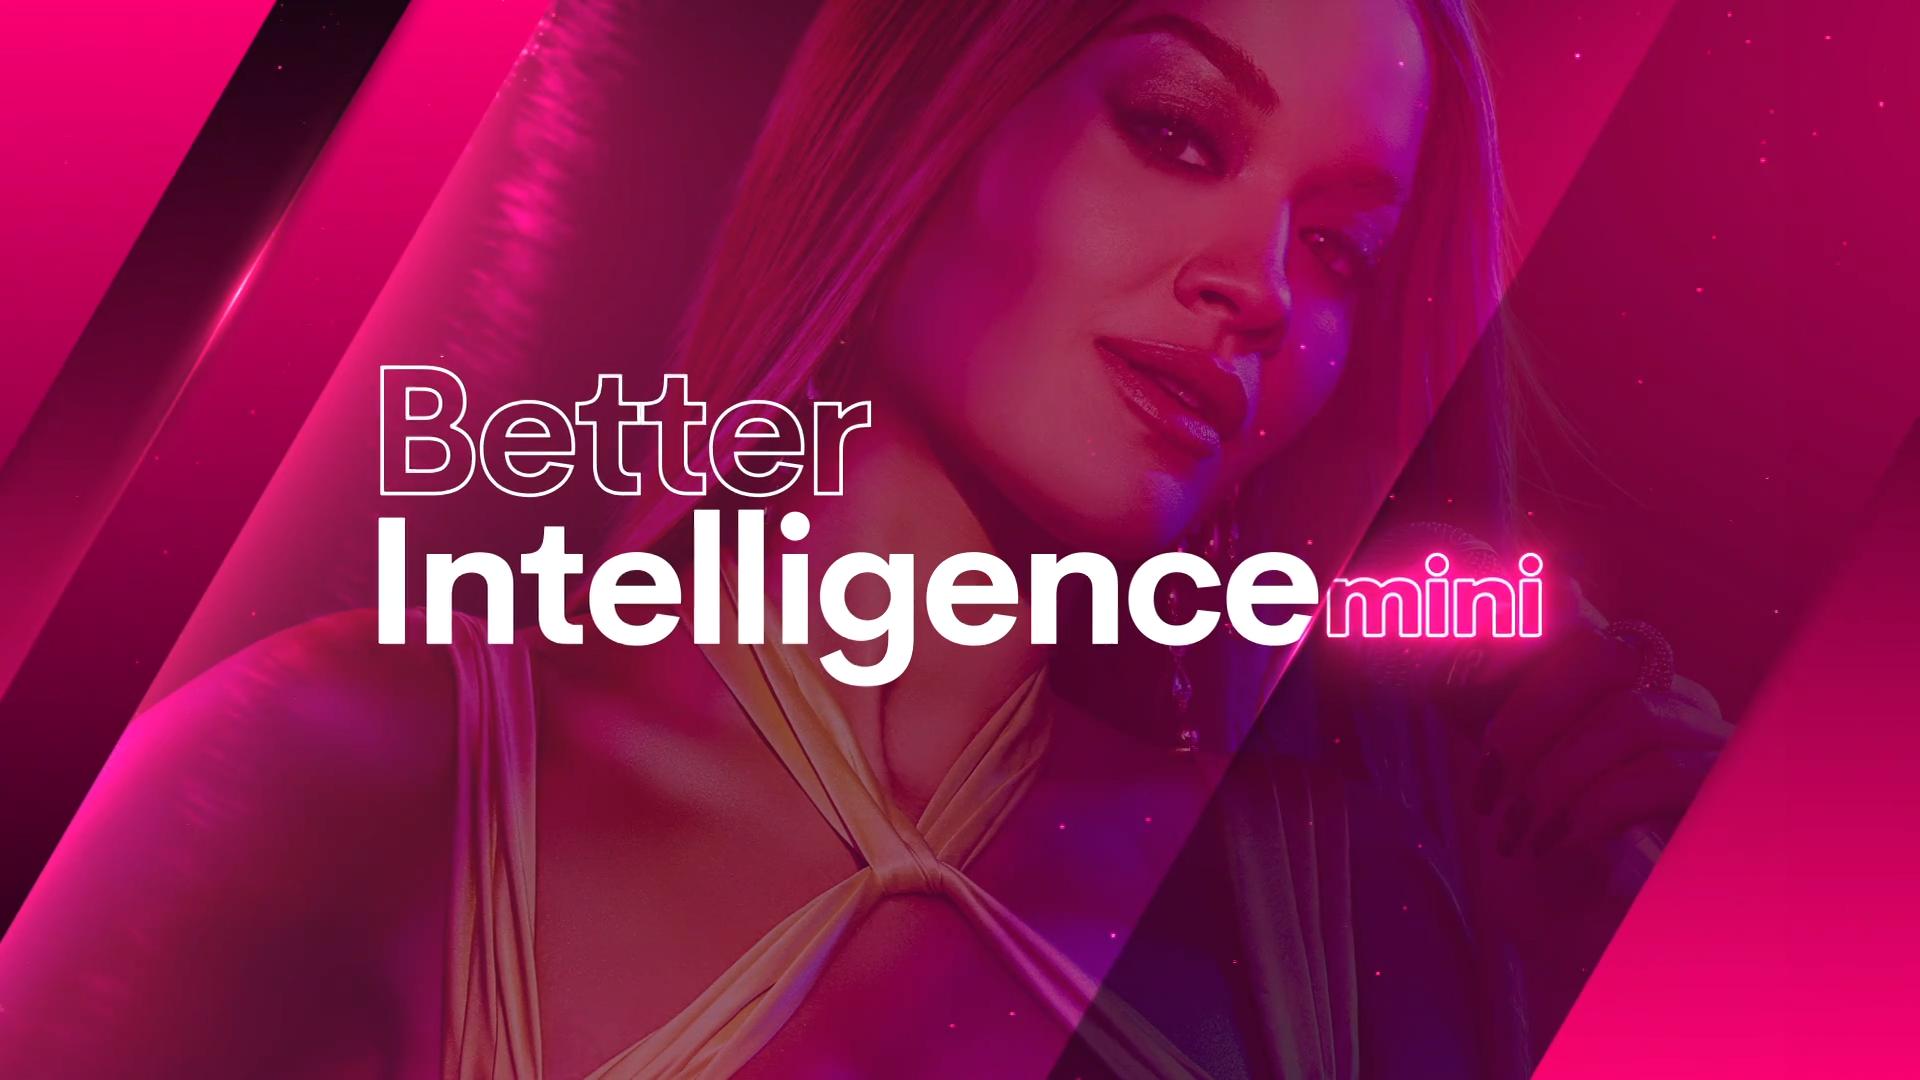 Better Intelligence